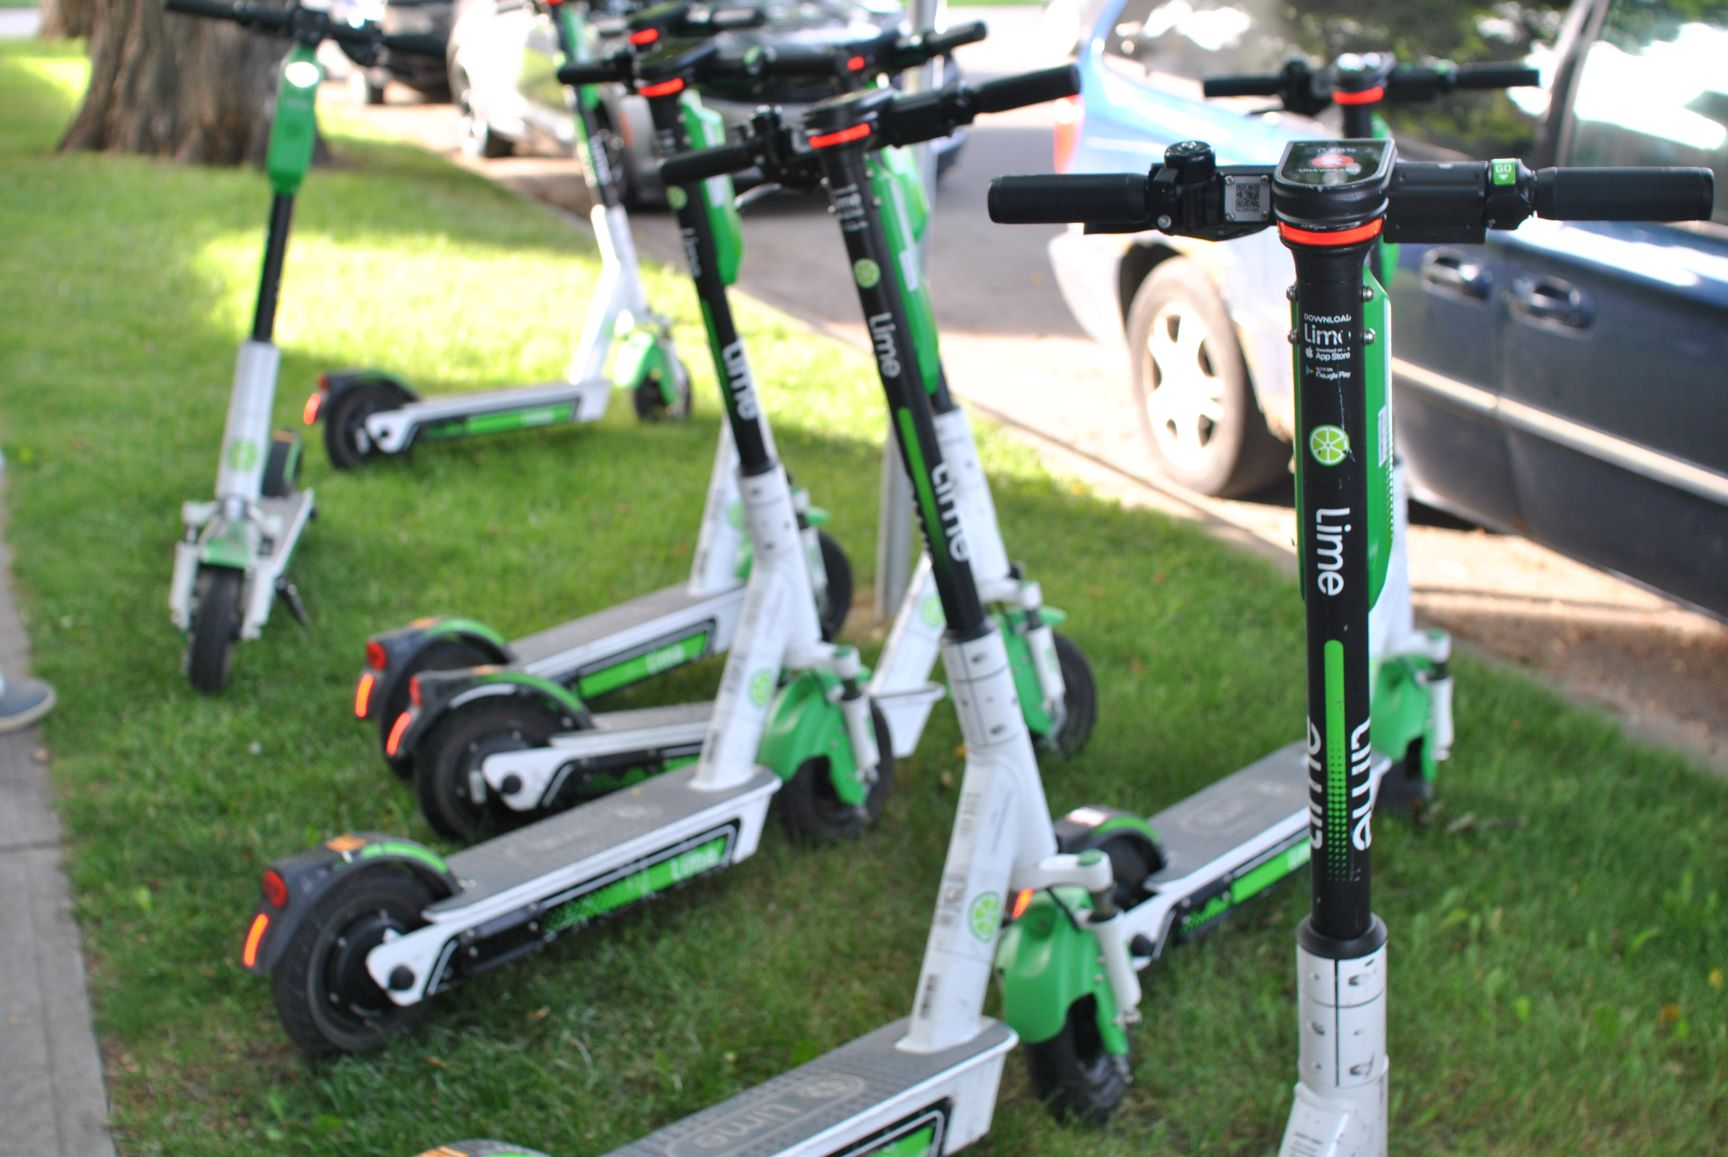 Travis Schultz savvy shoppers beware e-scooters